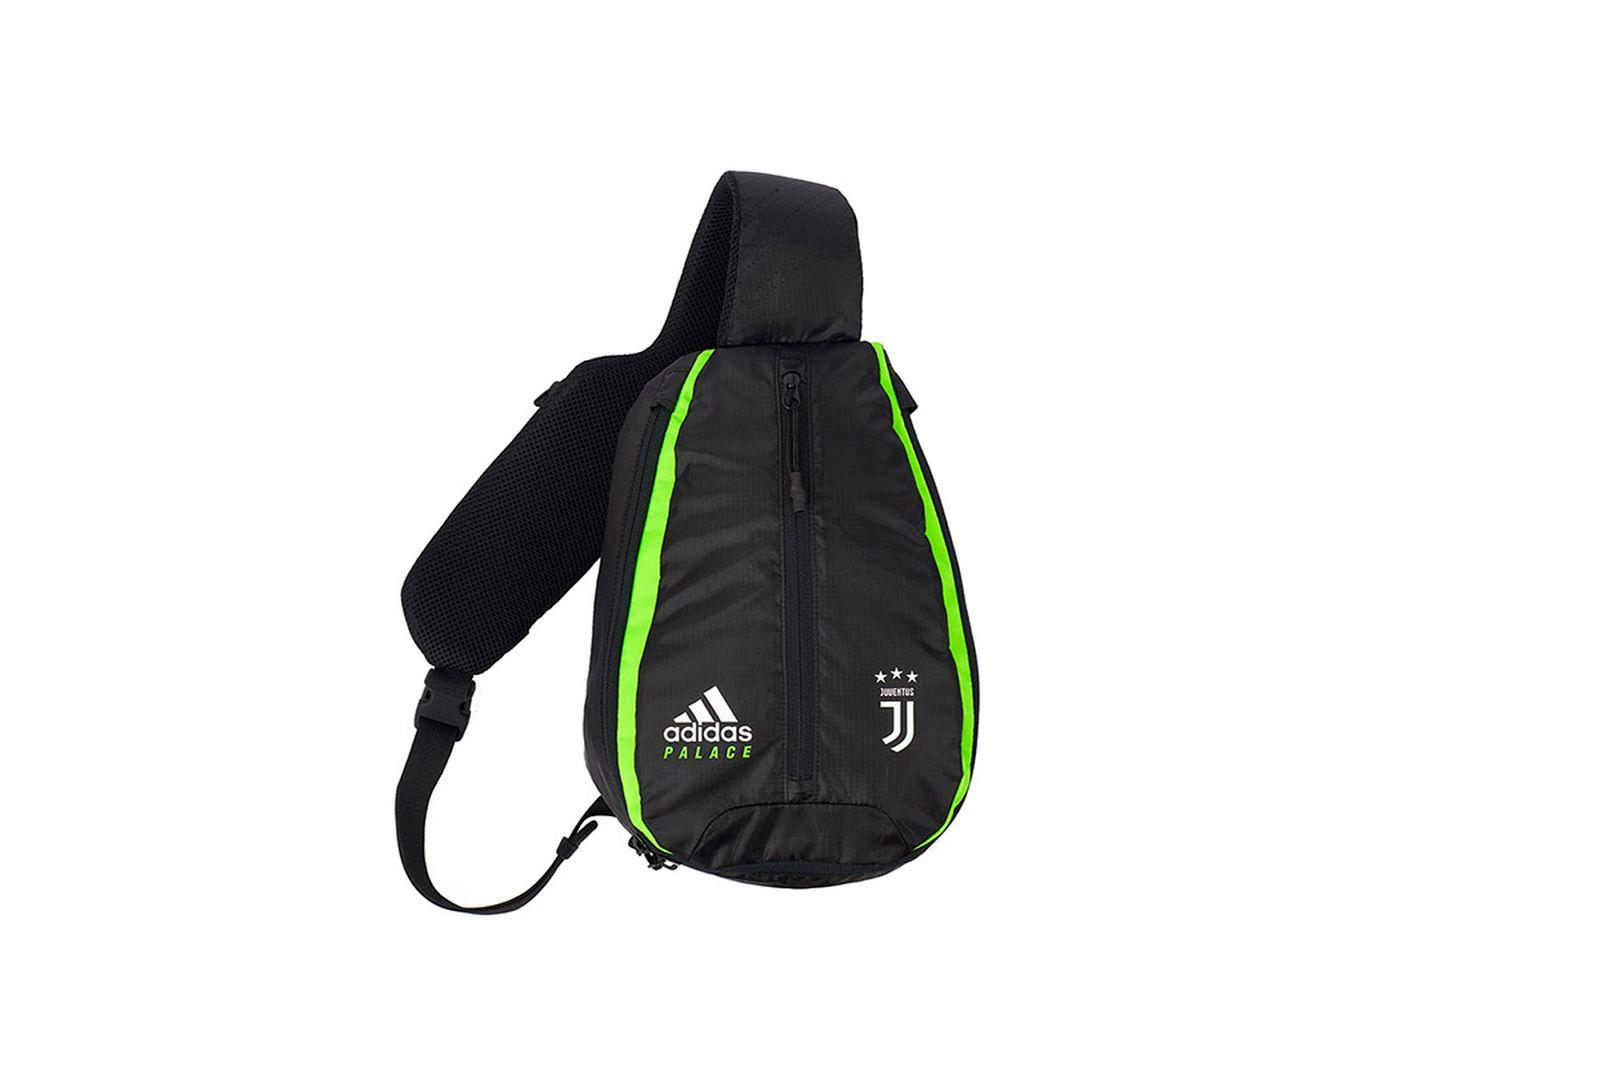 Palace-2019-Adidas-Juventus-Bag-19485